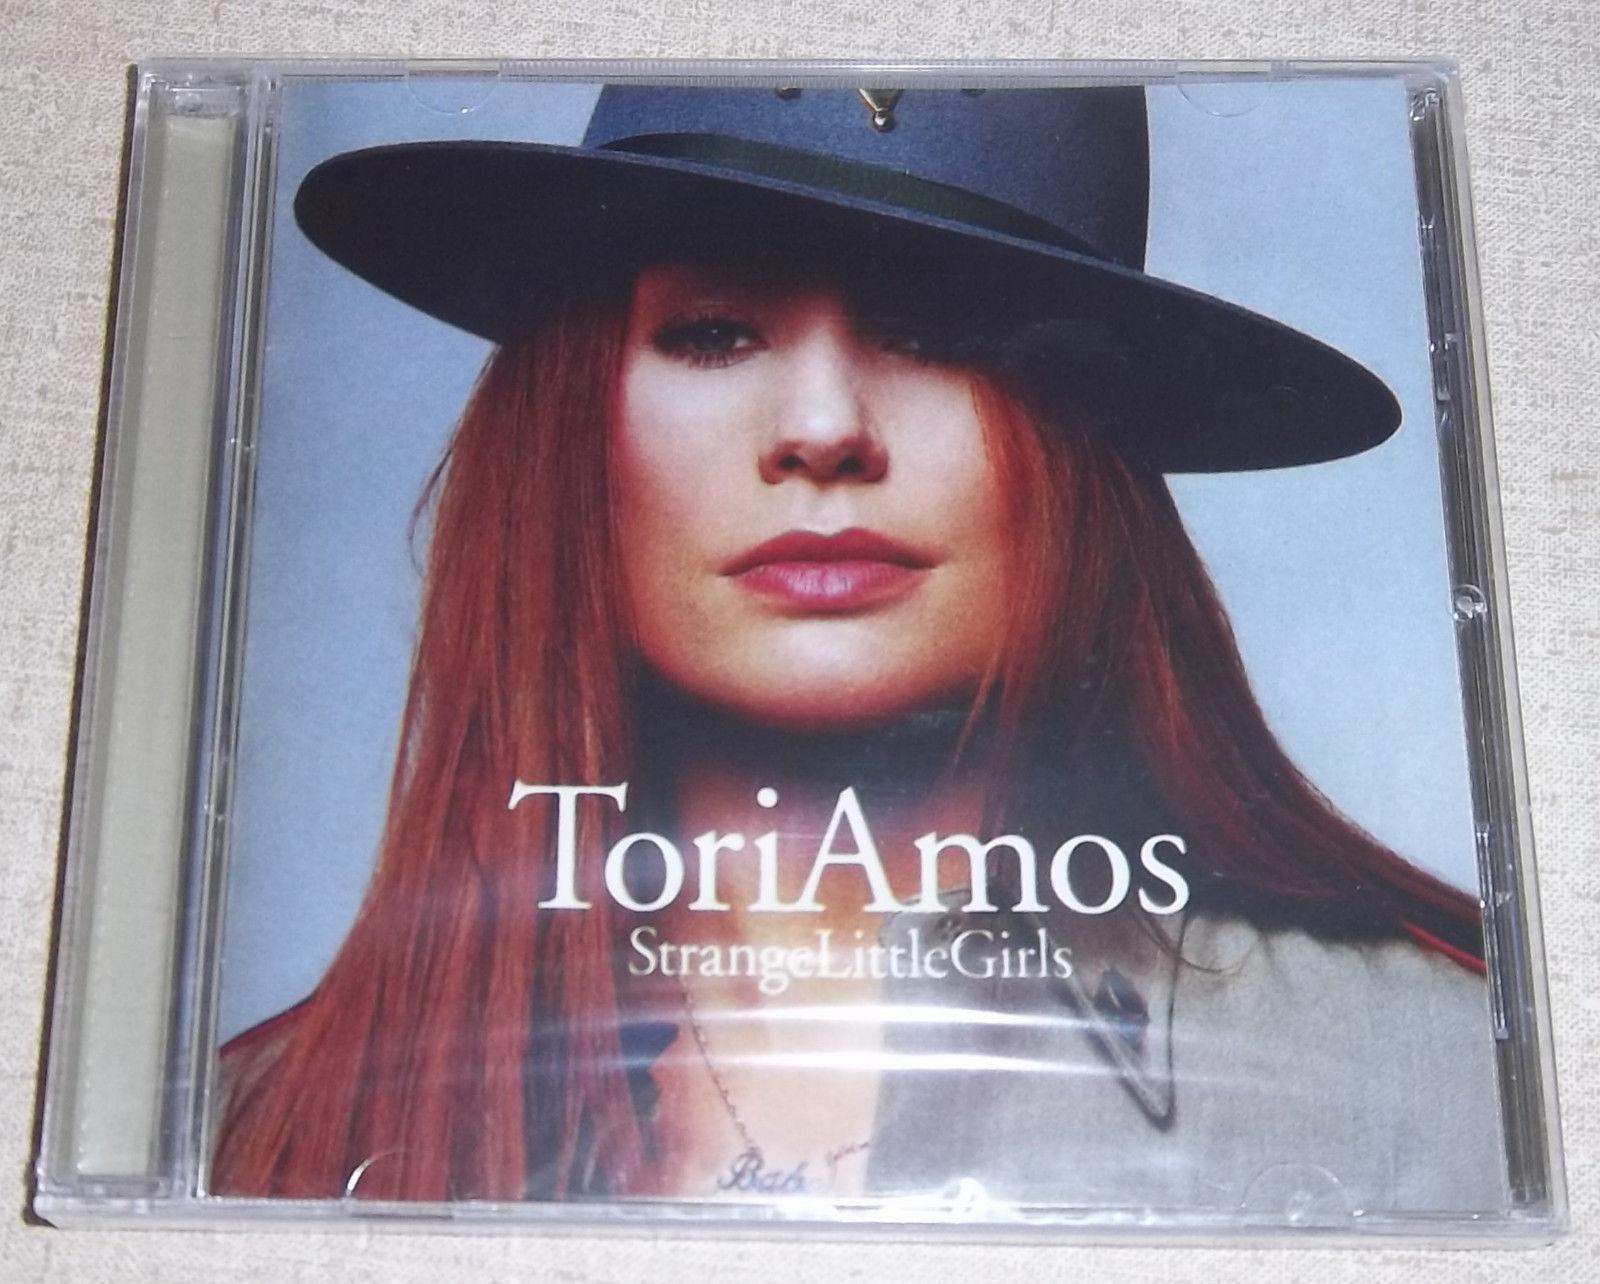 About Tori Amos